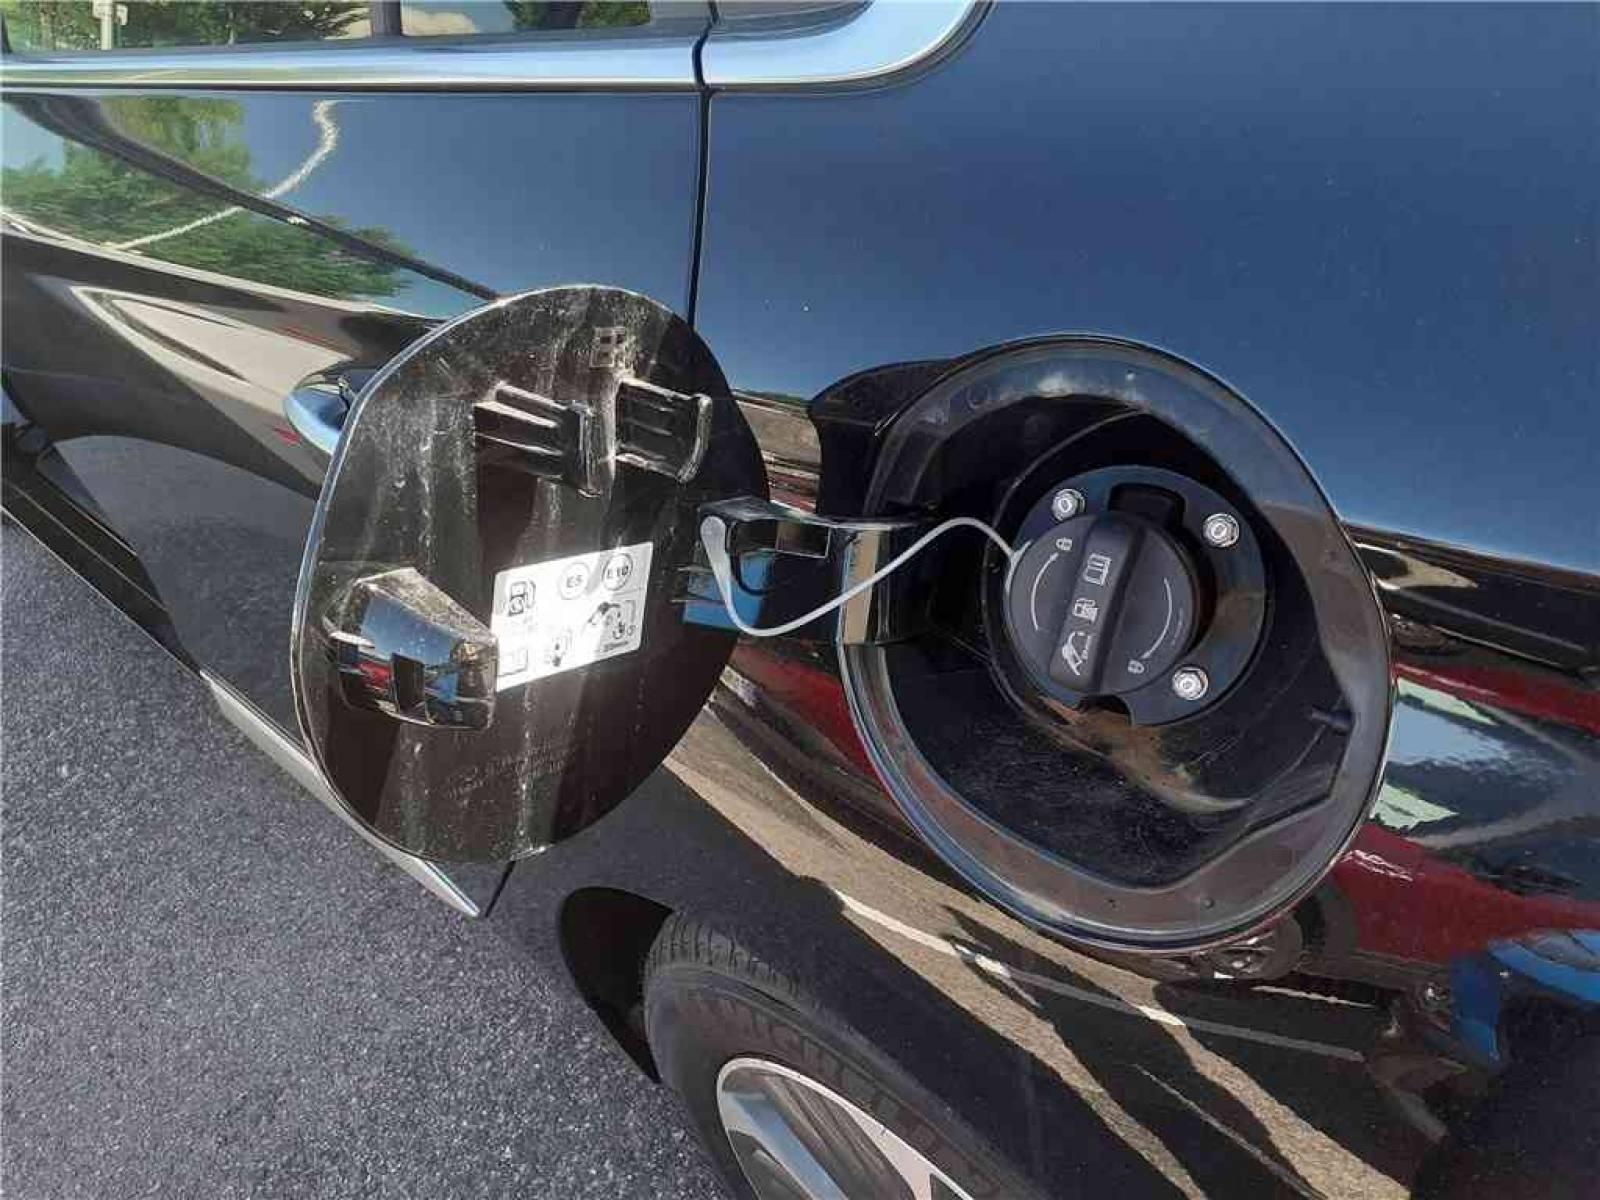 HYUNDAI Ioniq Plug-in 141 ch - véhicule d'occasion - Groupe Guillet - Chalon Automobiles - 71100 - Chalon-sur-Saône - 6